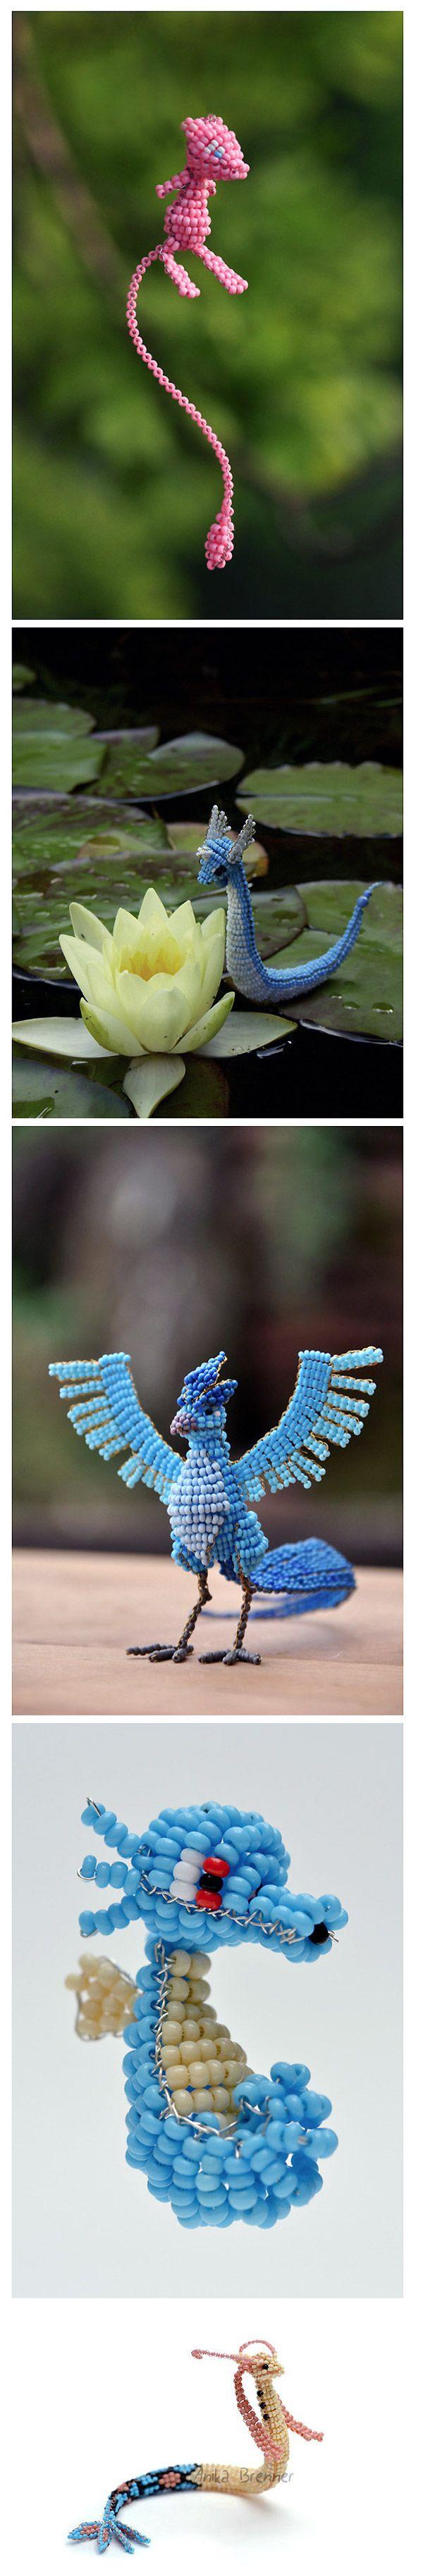 Figuras de pokémon con cuentas de abalorios.